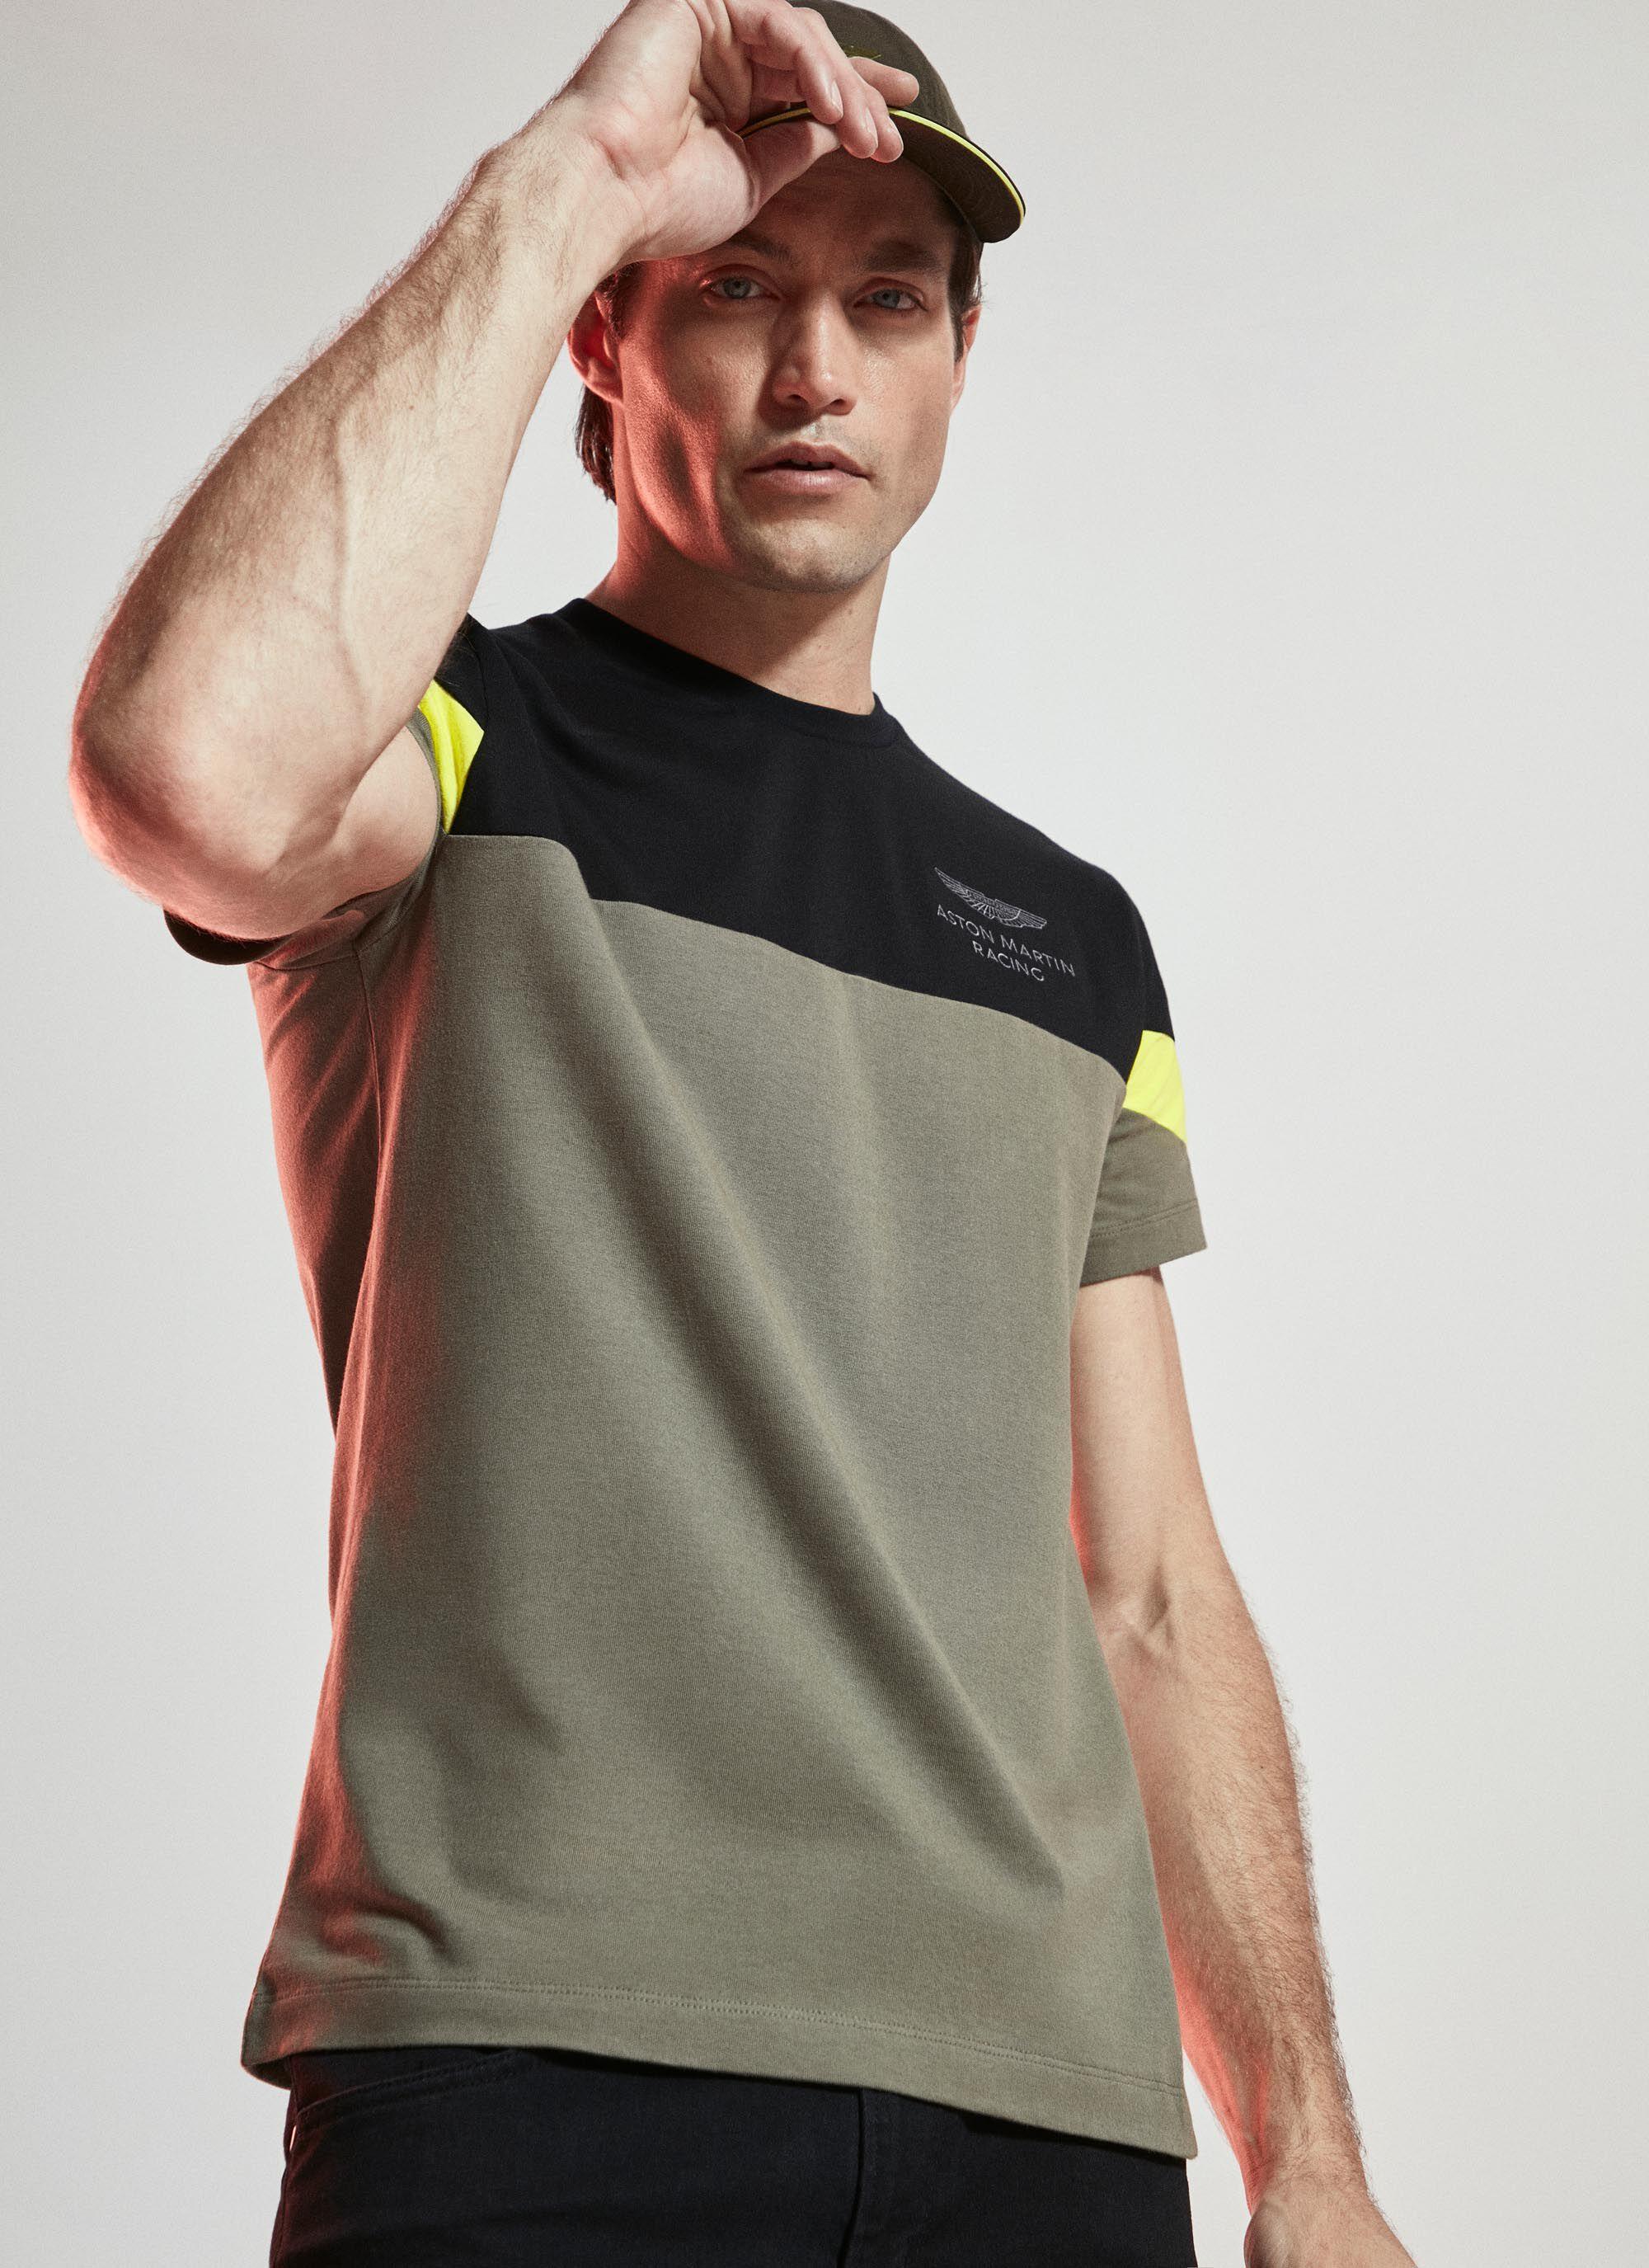 aston martin racing men's sleeve stripe detail cotton jersey t-shirt | x-small | black/green